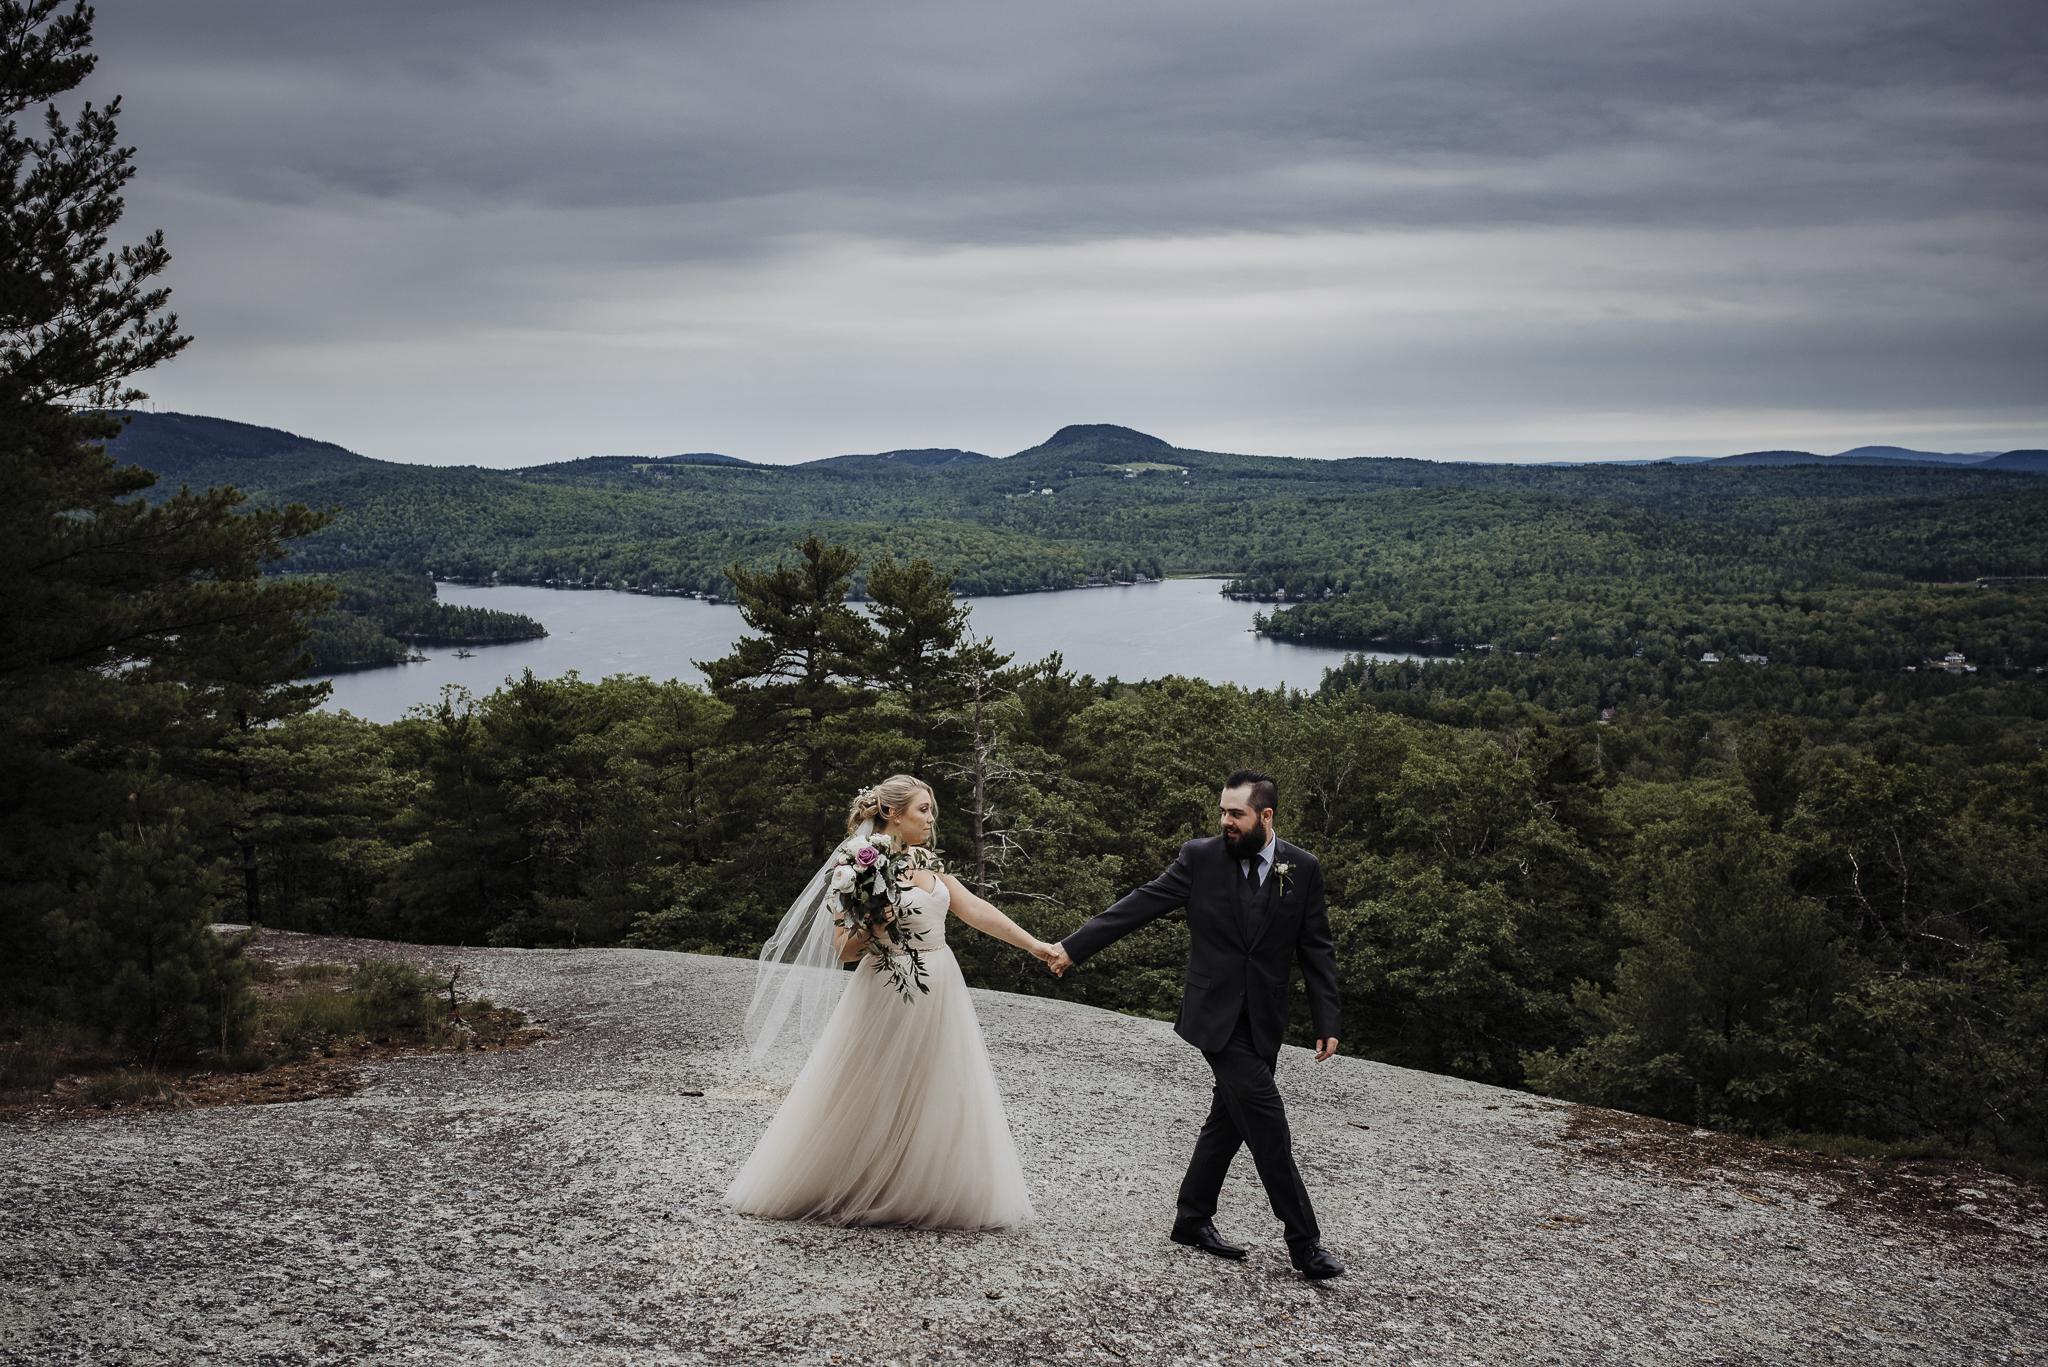 Corinna Maine wedding photography-20.jpg